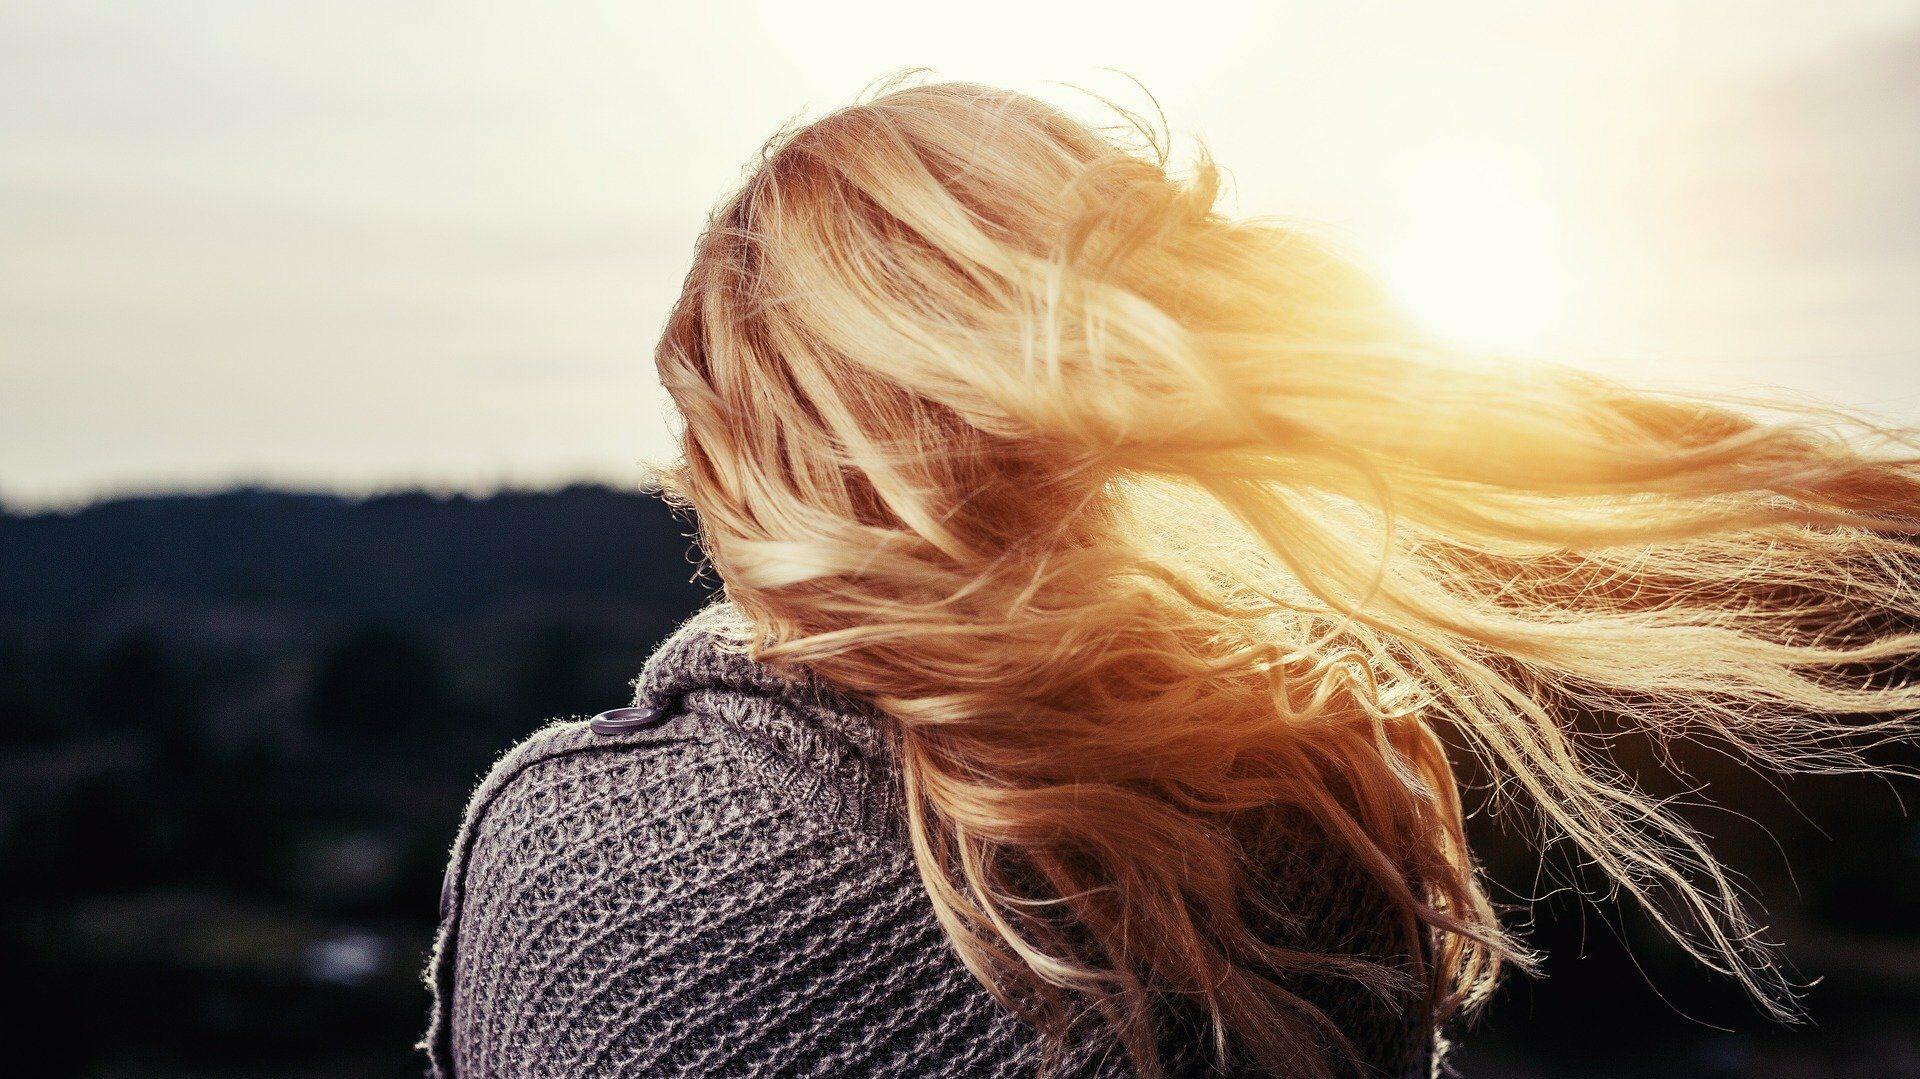 woman and sun rising